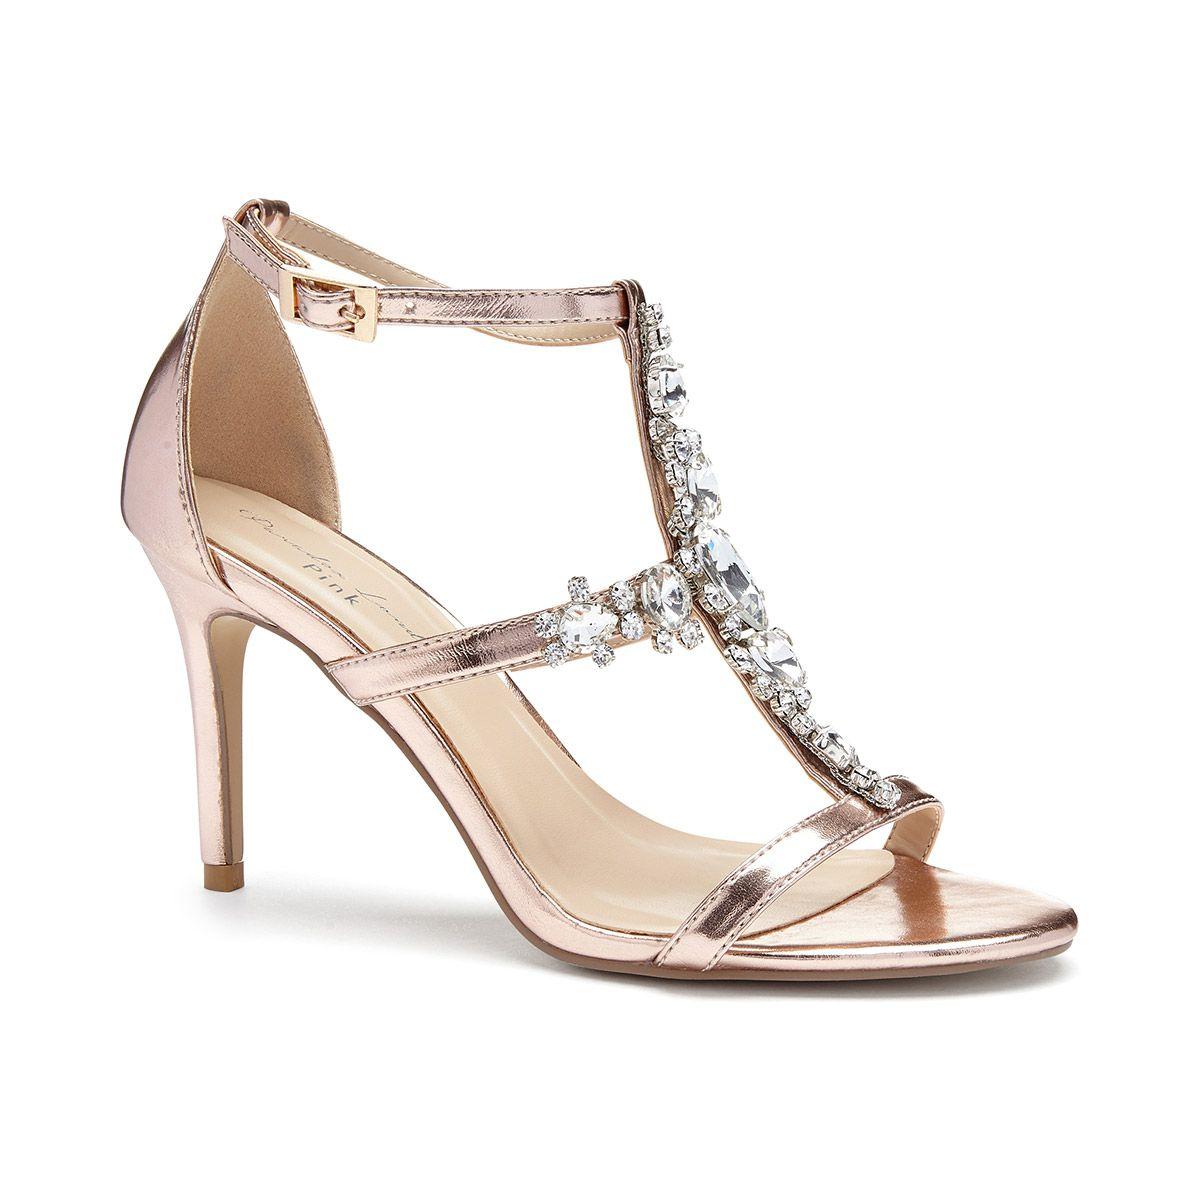 a62dc14e10b7 Stella Rose Gold Metallic High Heel Cross Strap Sandal